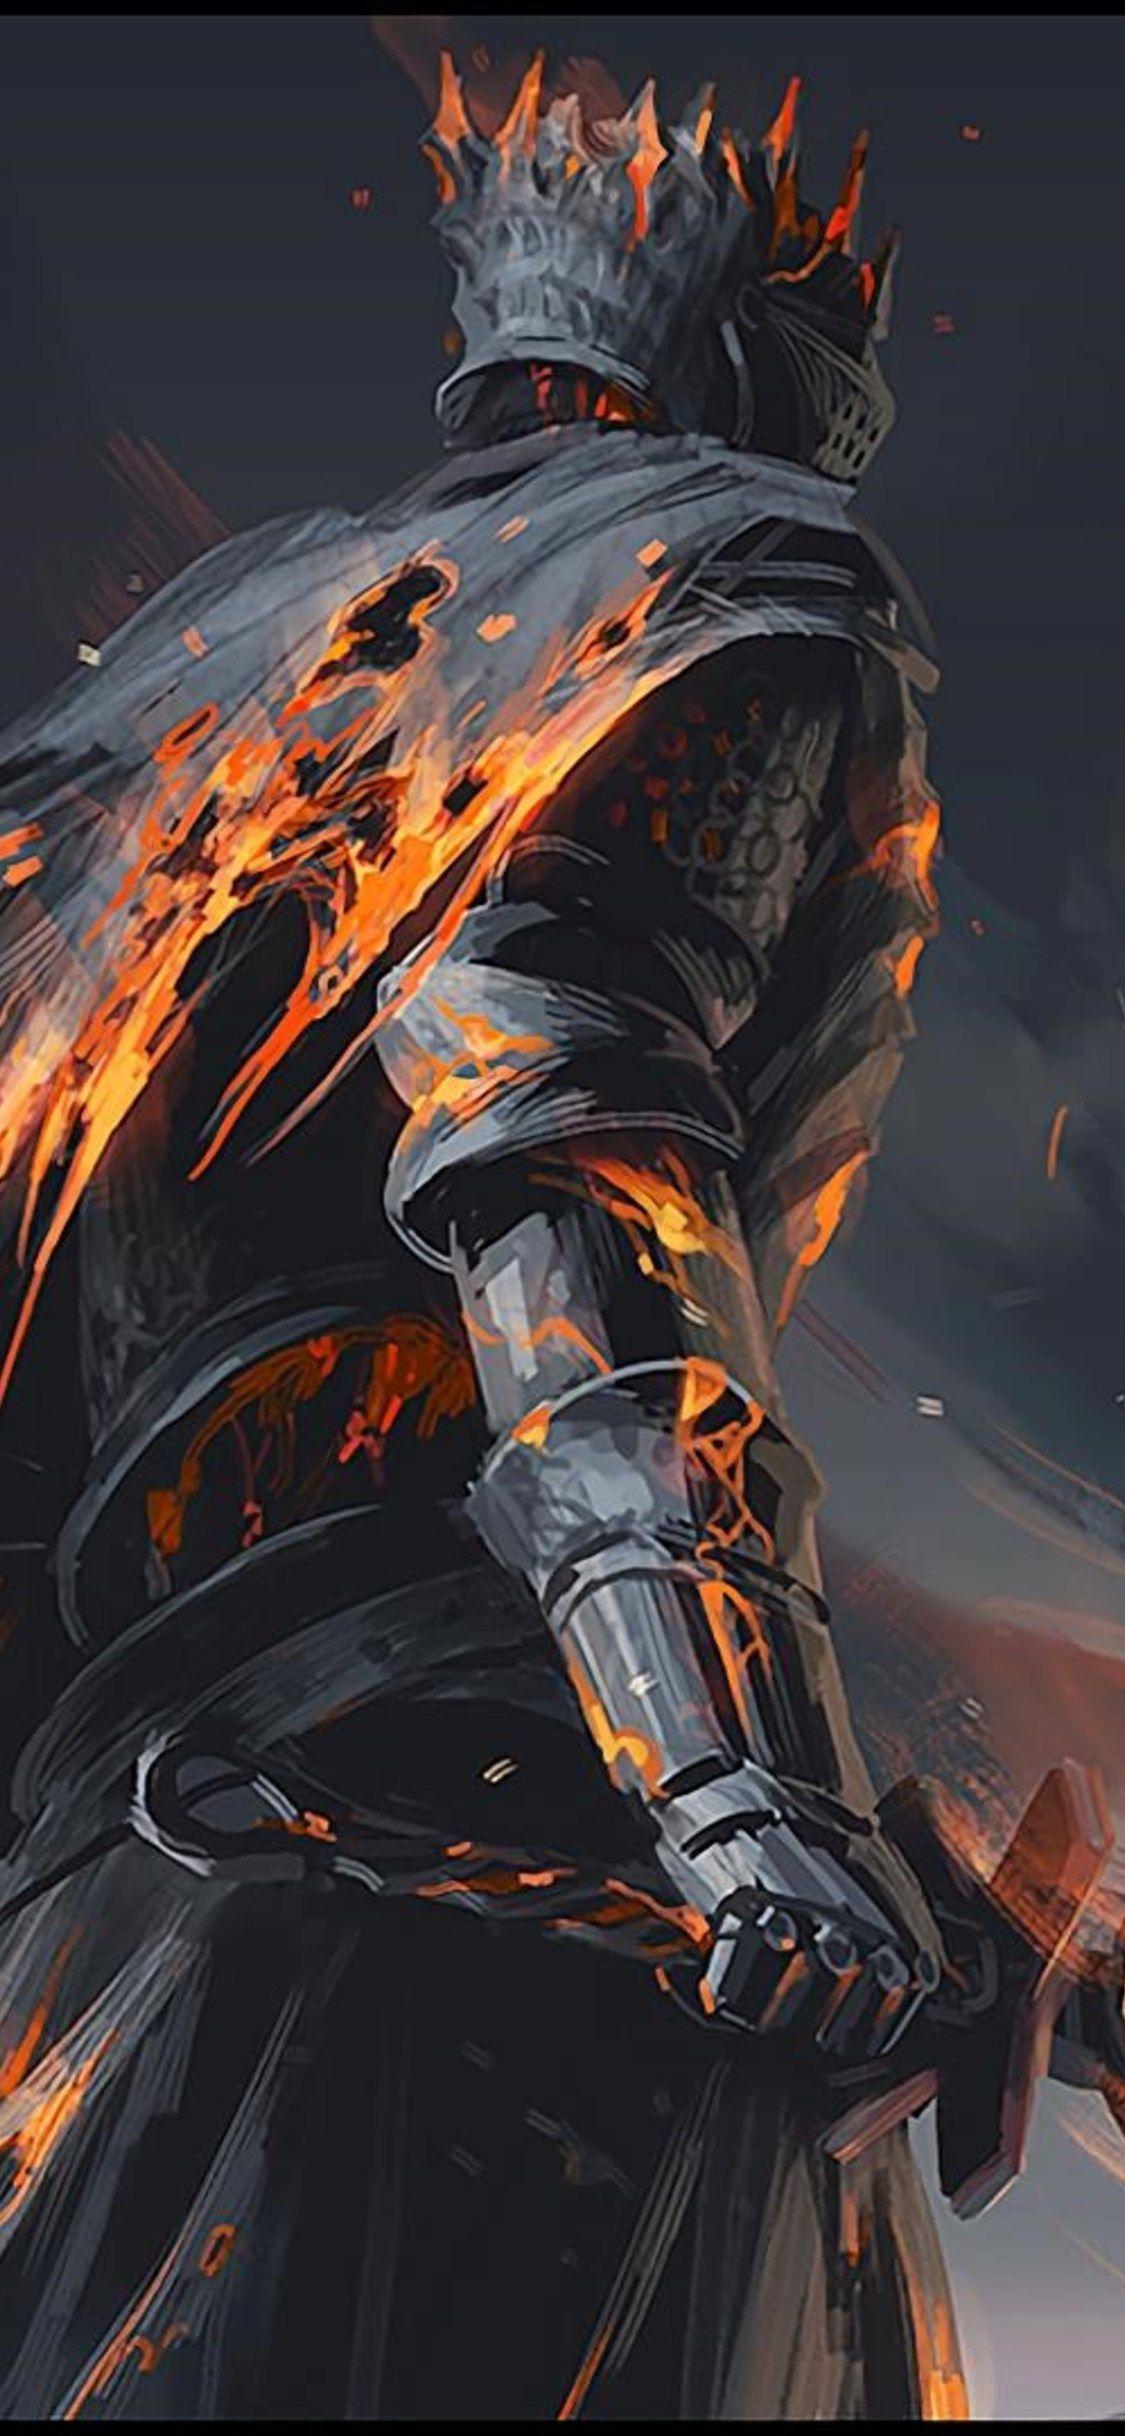 Dark Souls Iphone Wallpapers Top Free Dark Souls Iphone Backgrounds Wallpaperaccess